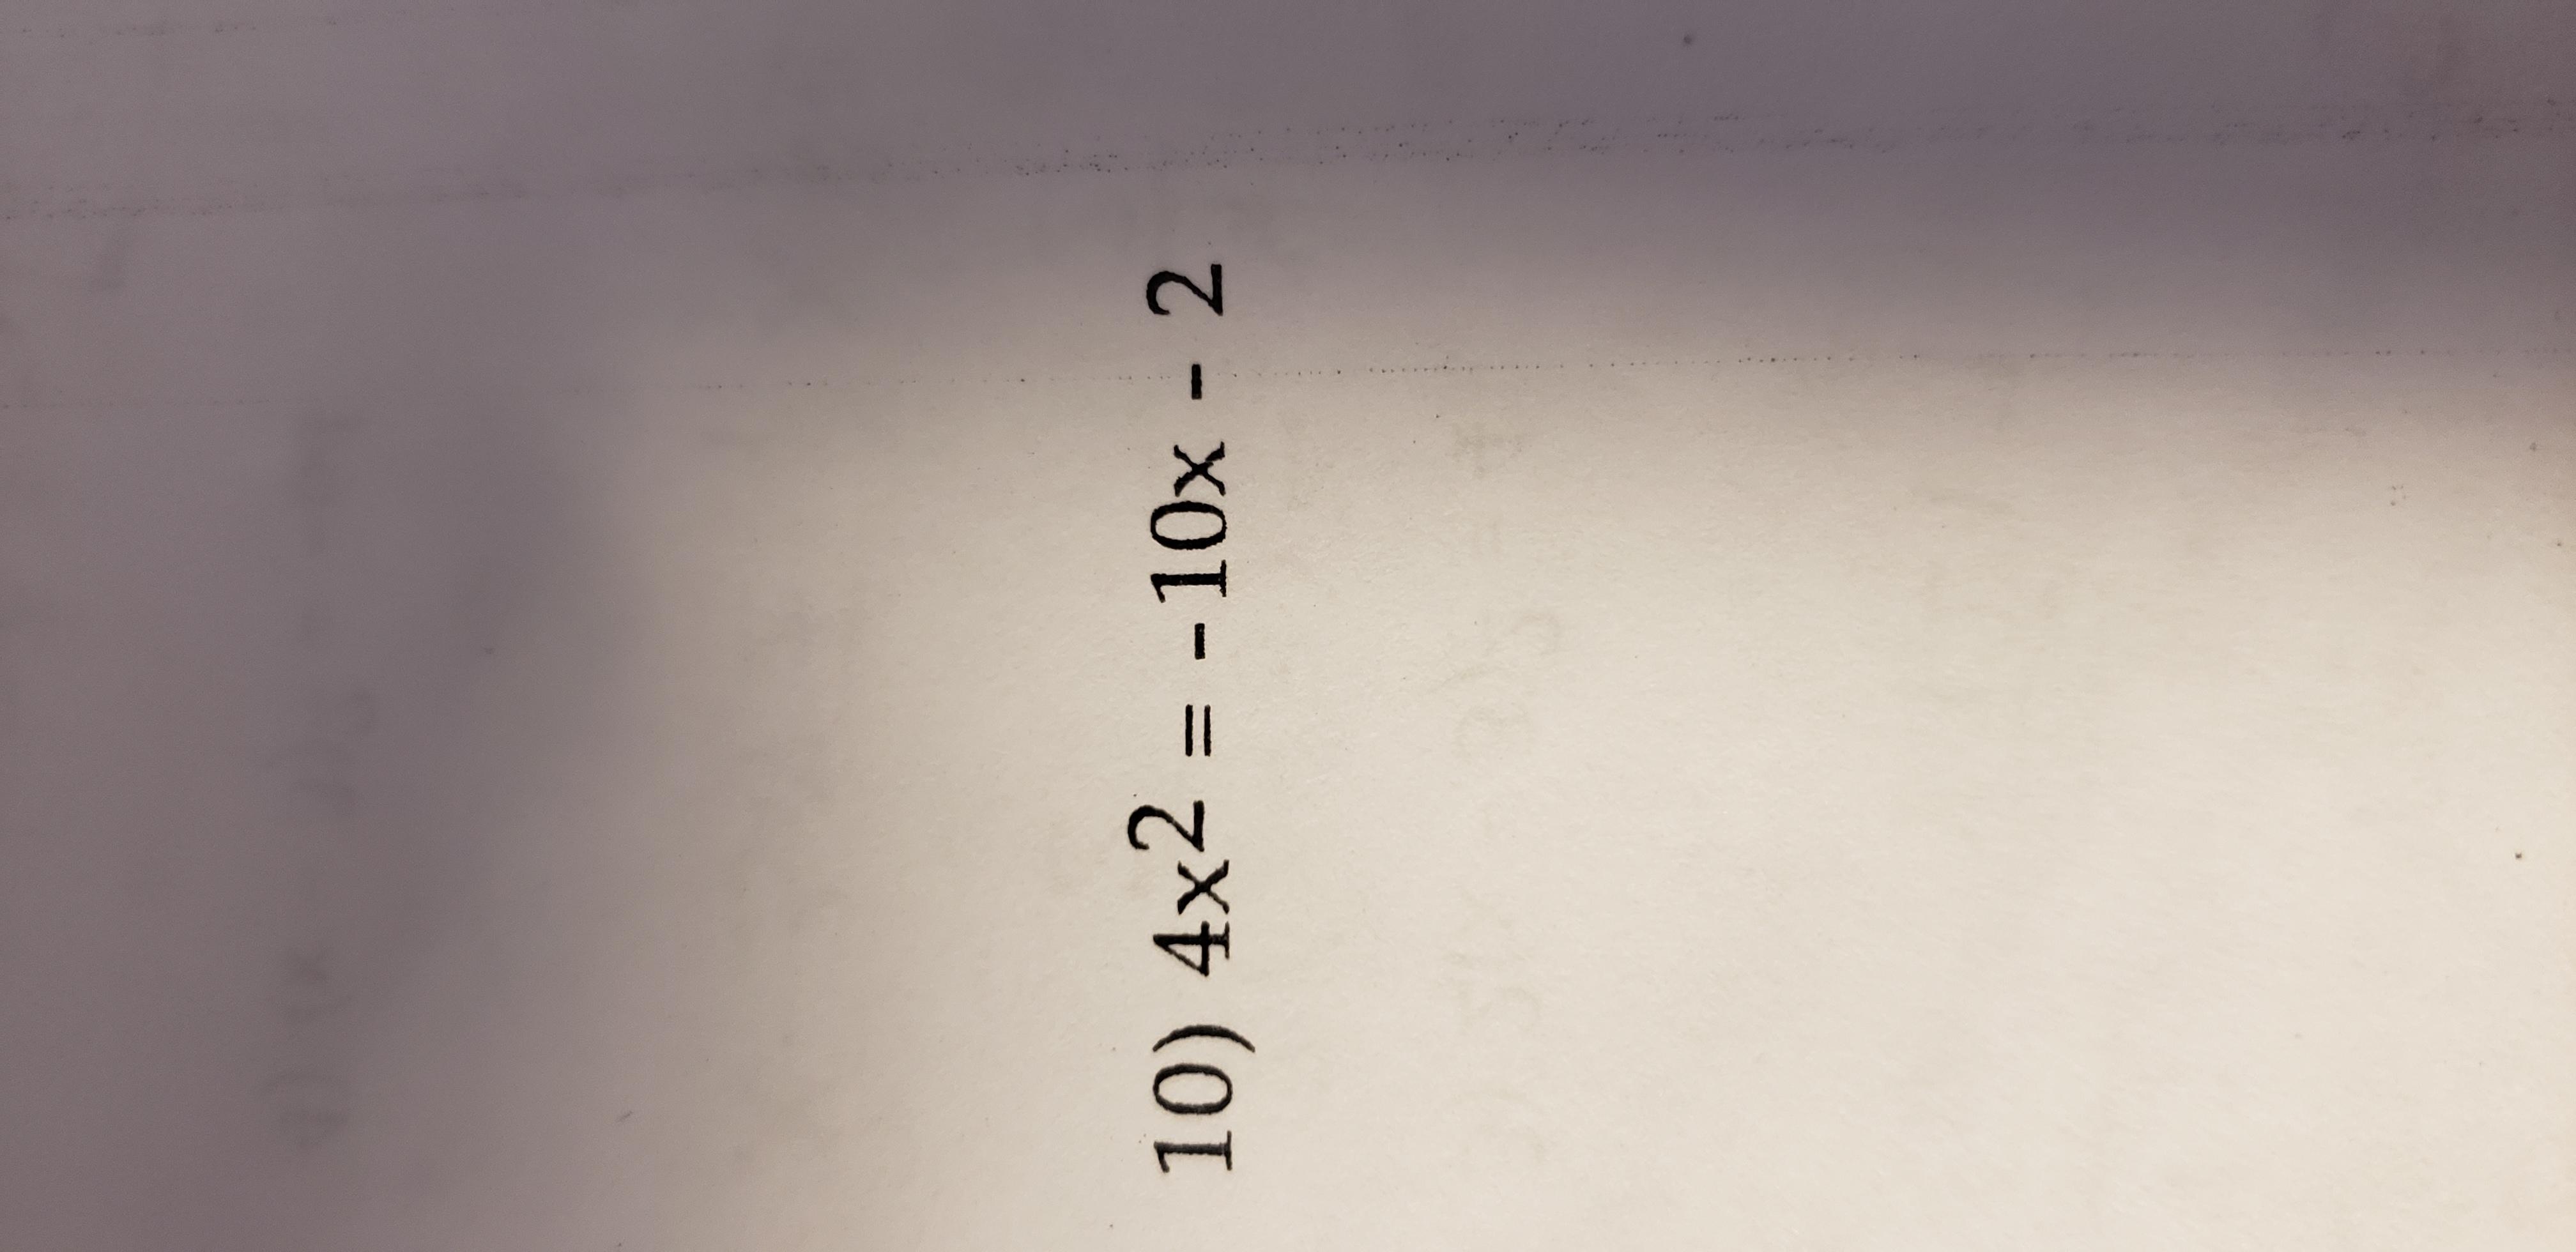 10) 4x2 -10x 2